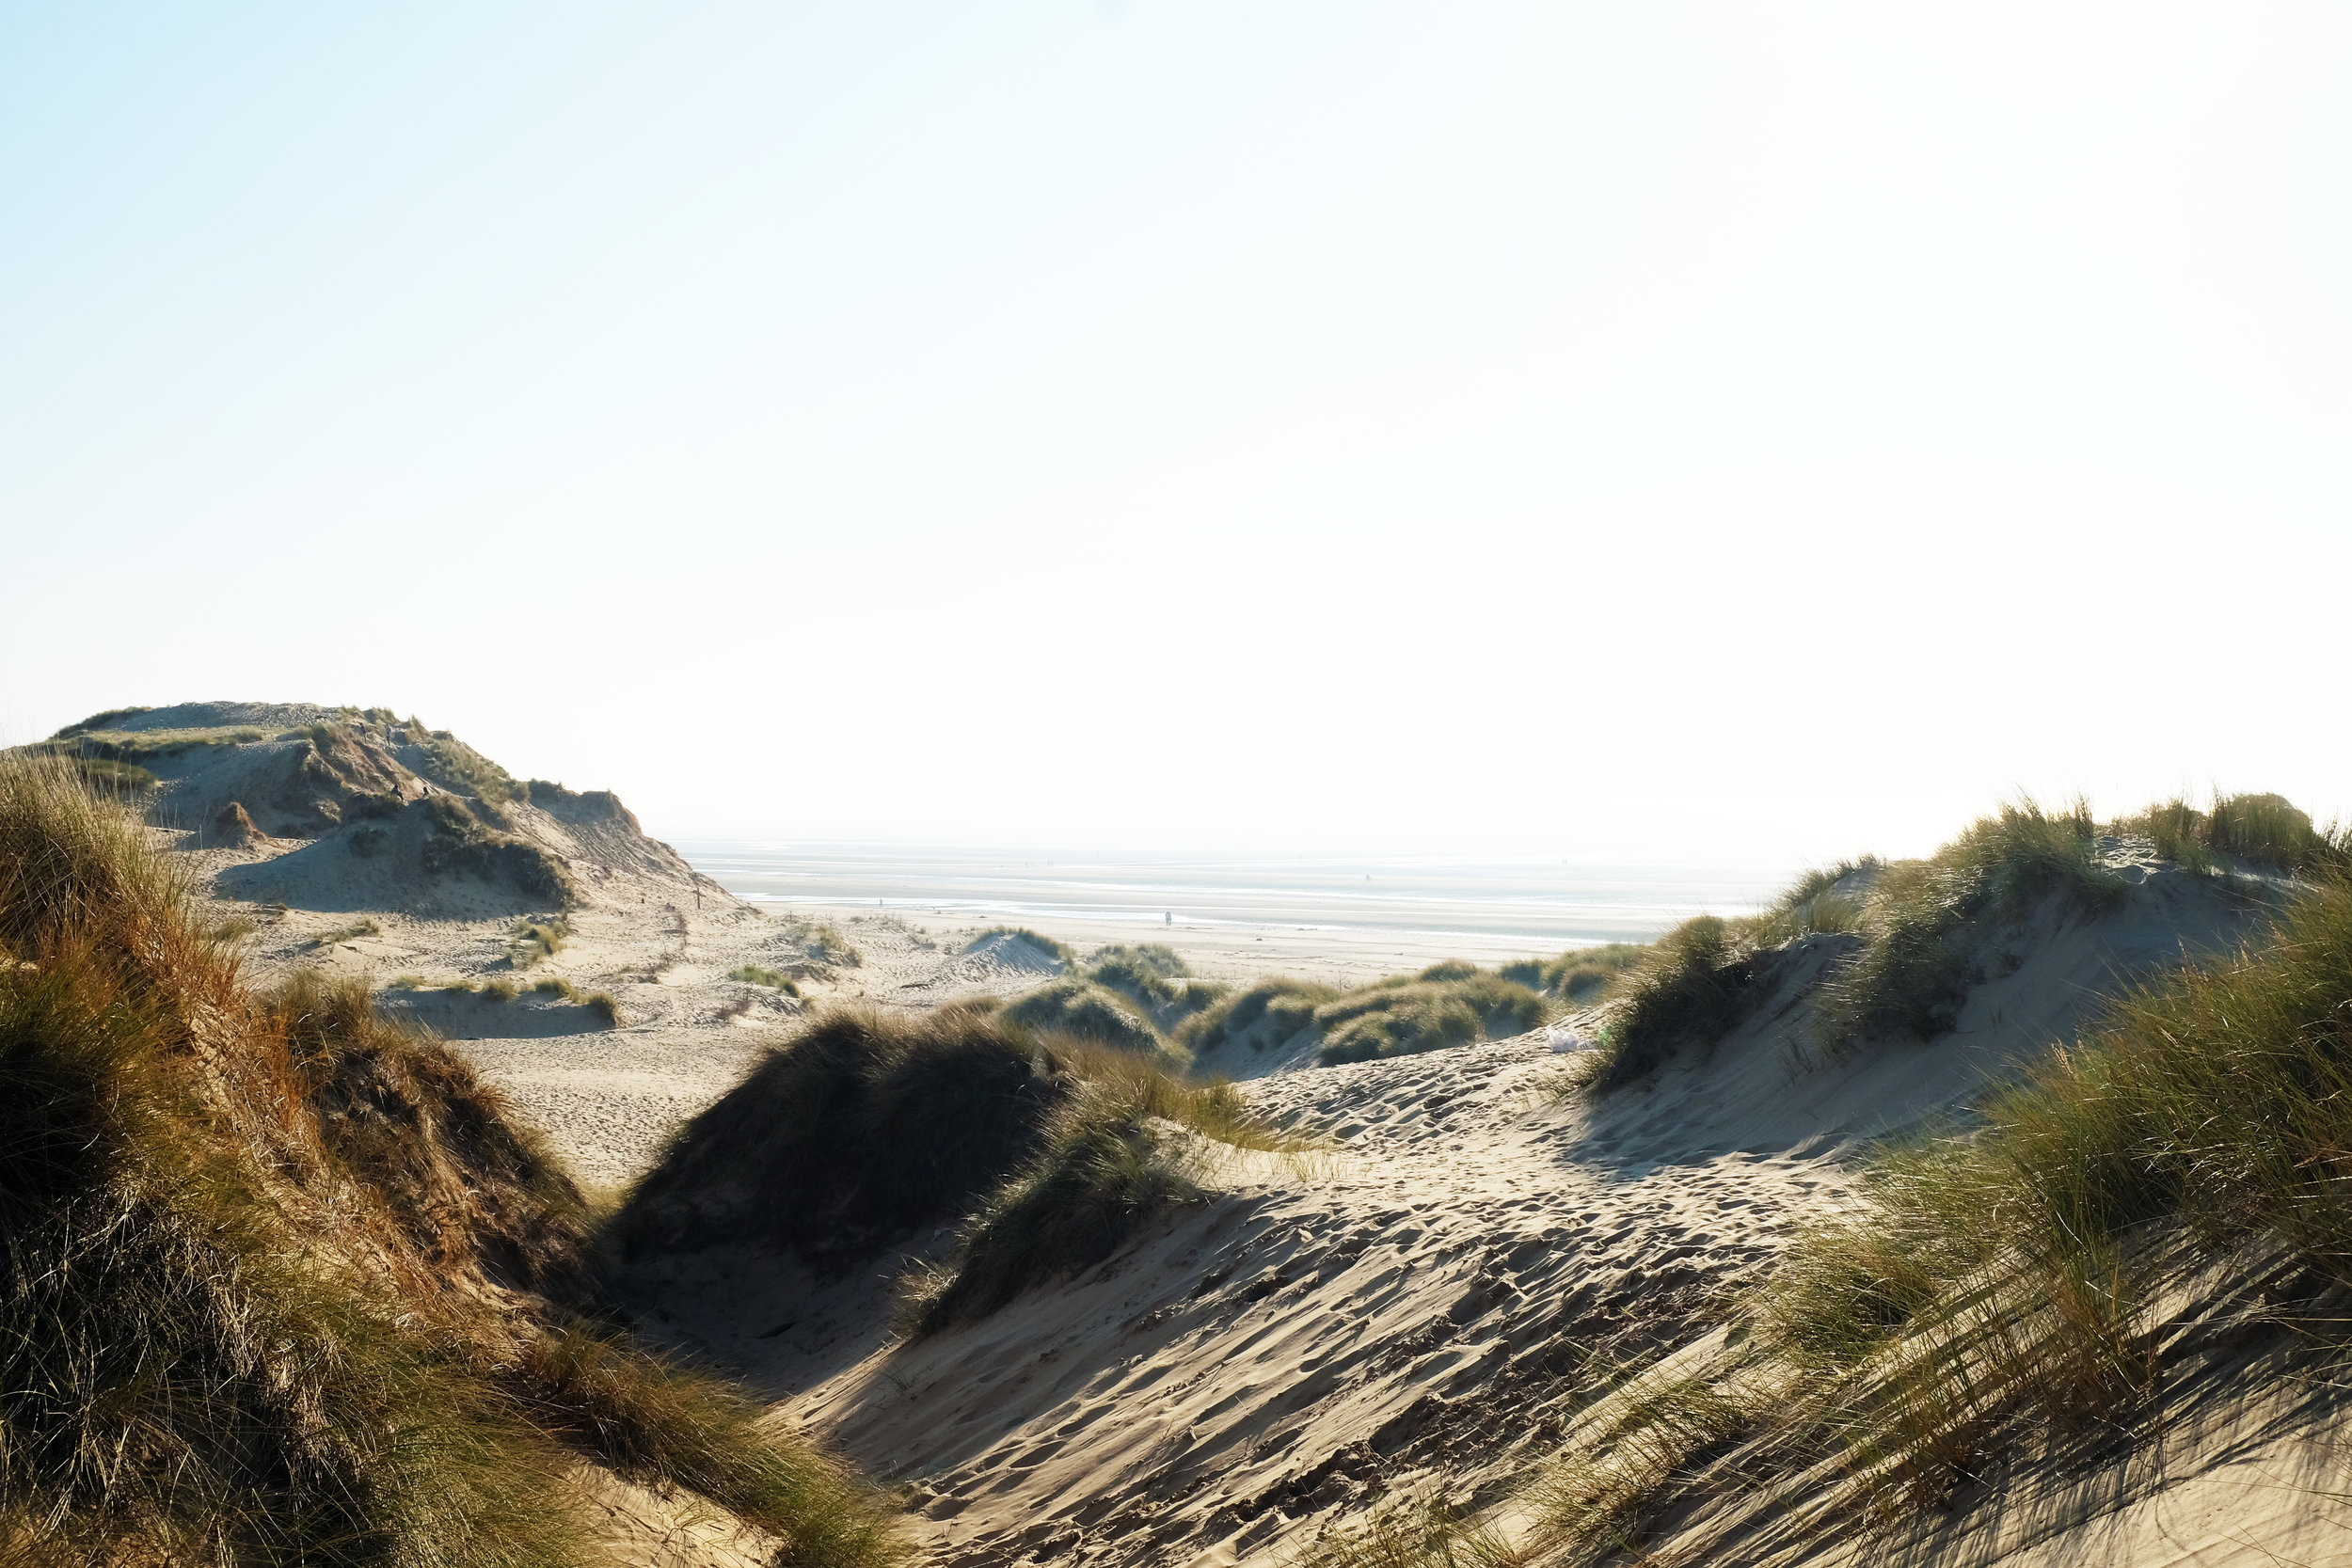 arzucan nur askin   White Dunes (May 2018, Formby Beach, United Kingdom)